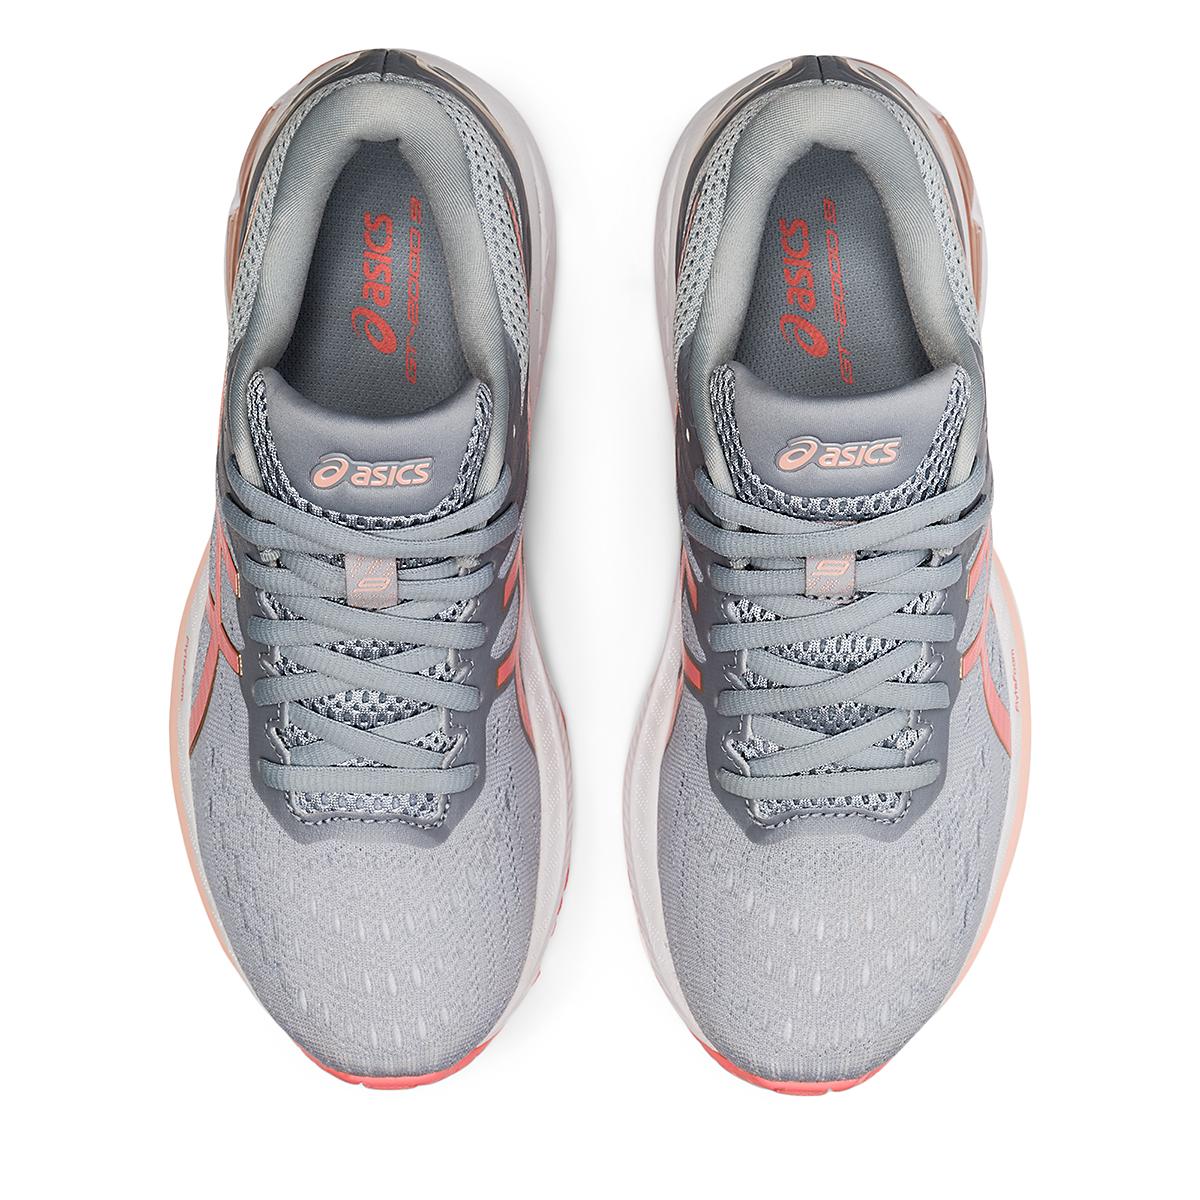 Women's Asics GT-2000 9 Running Shoe - Color: Piedmont Grey/Guava - Size: 5 - Width: Regular, Piedmont Grey/Guava, large, image 5